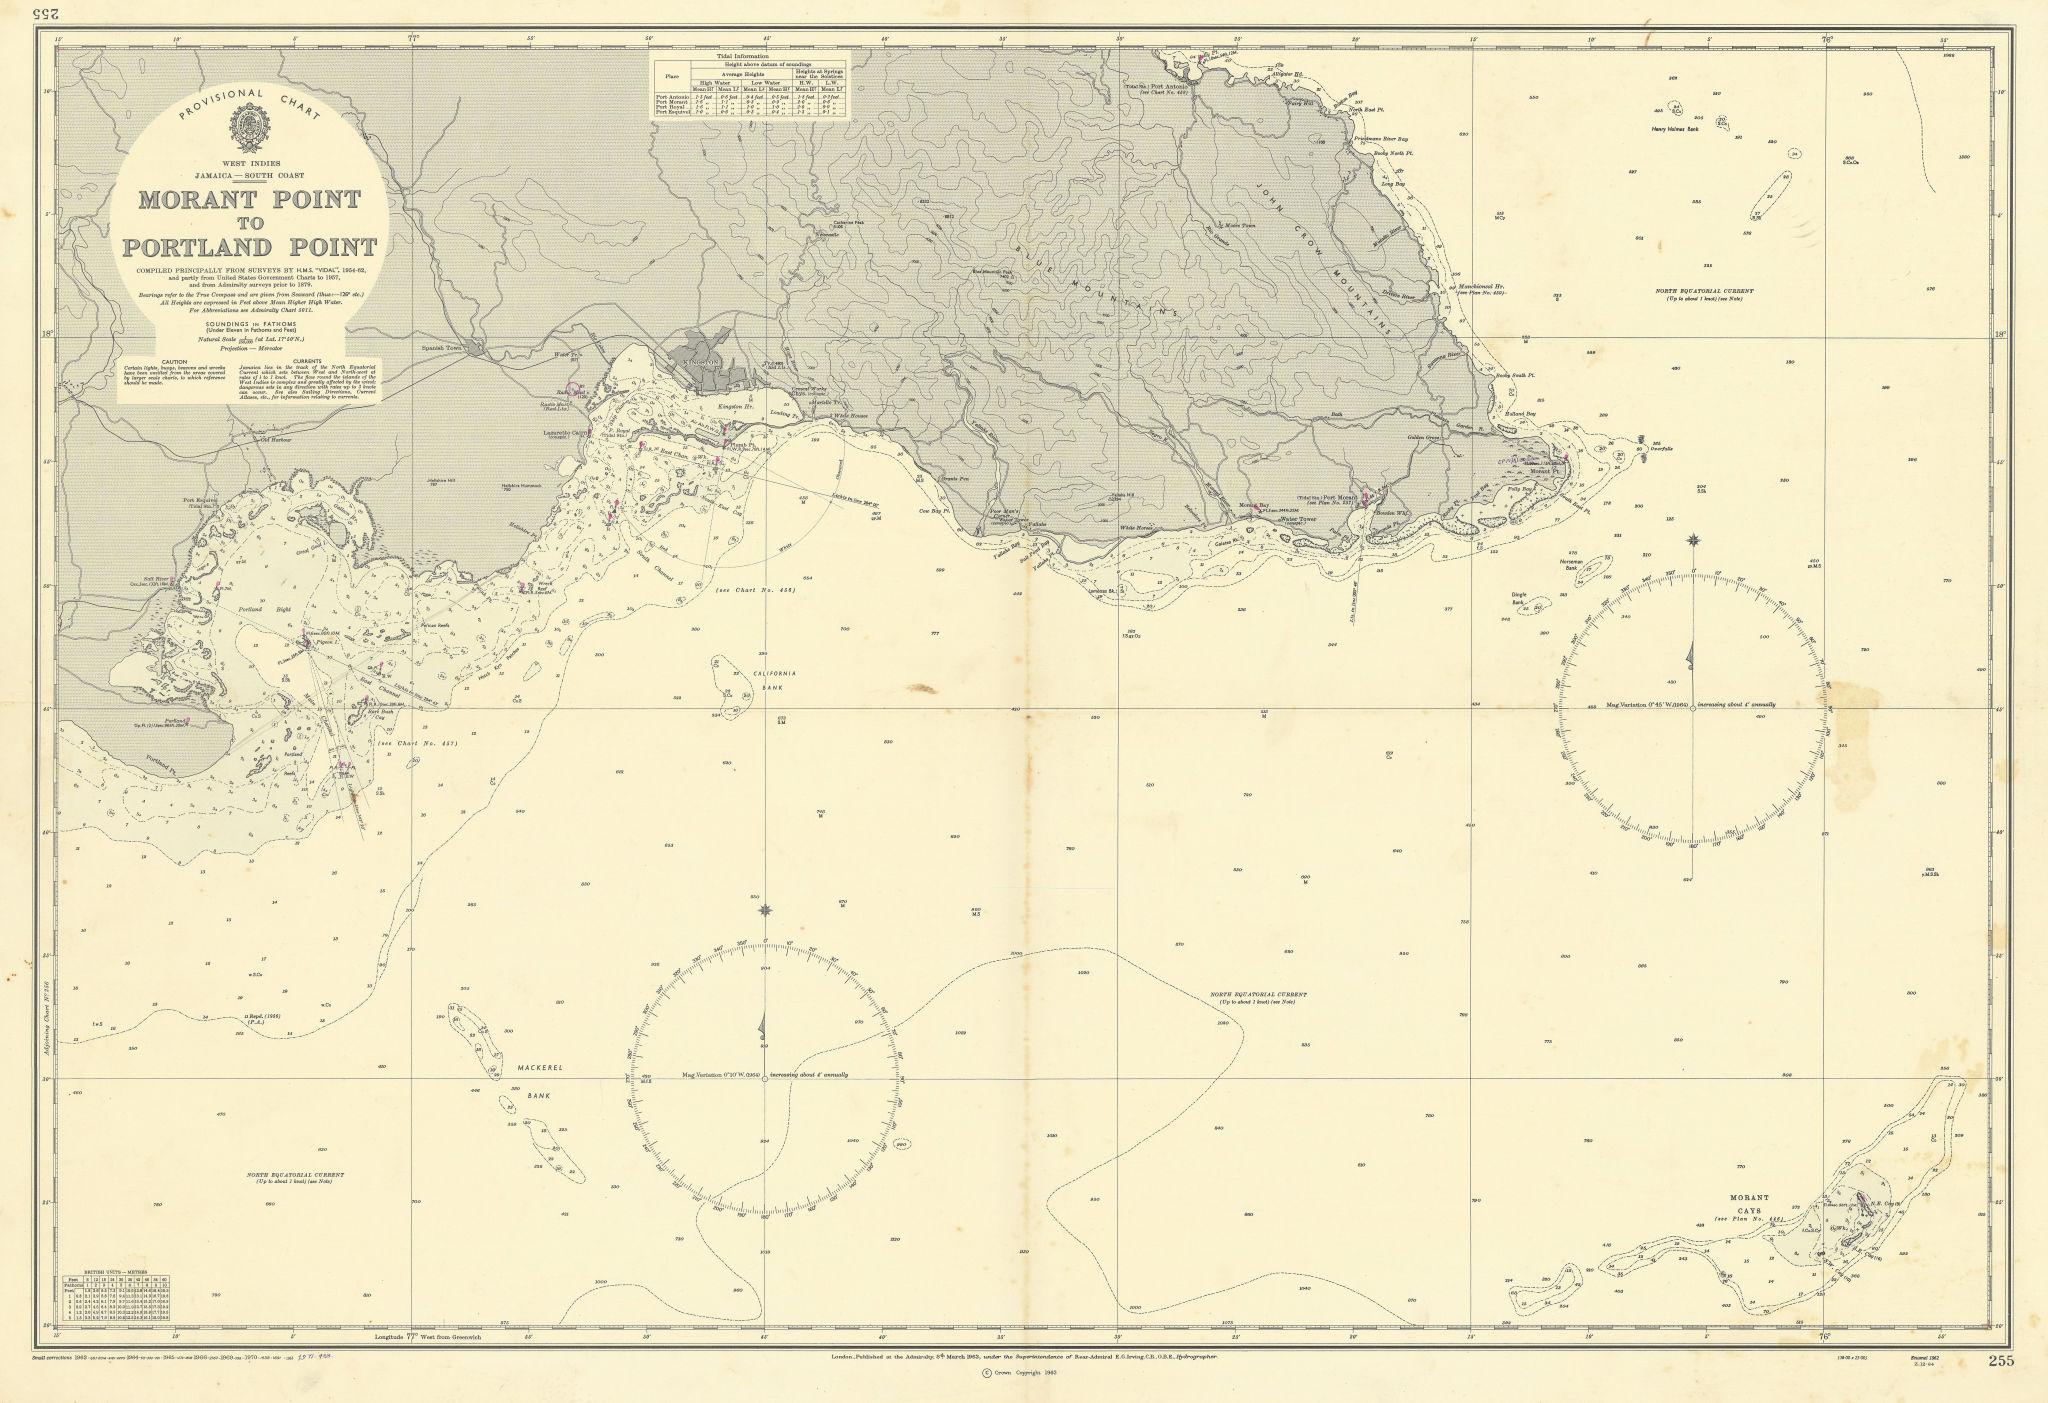 Jamaica SE coast Morant-Portland Pt Kingston ADMIRALTY sea chart 1963 (1971) map